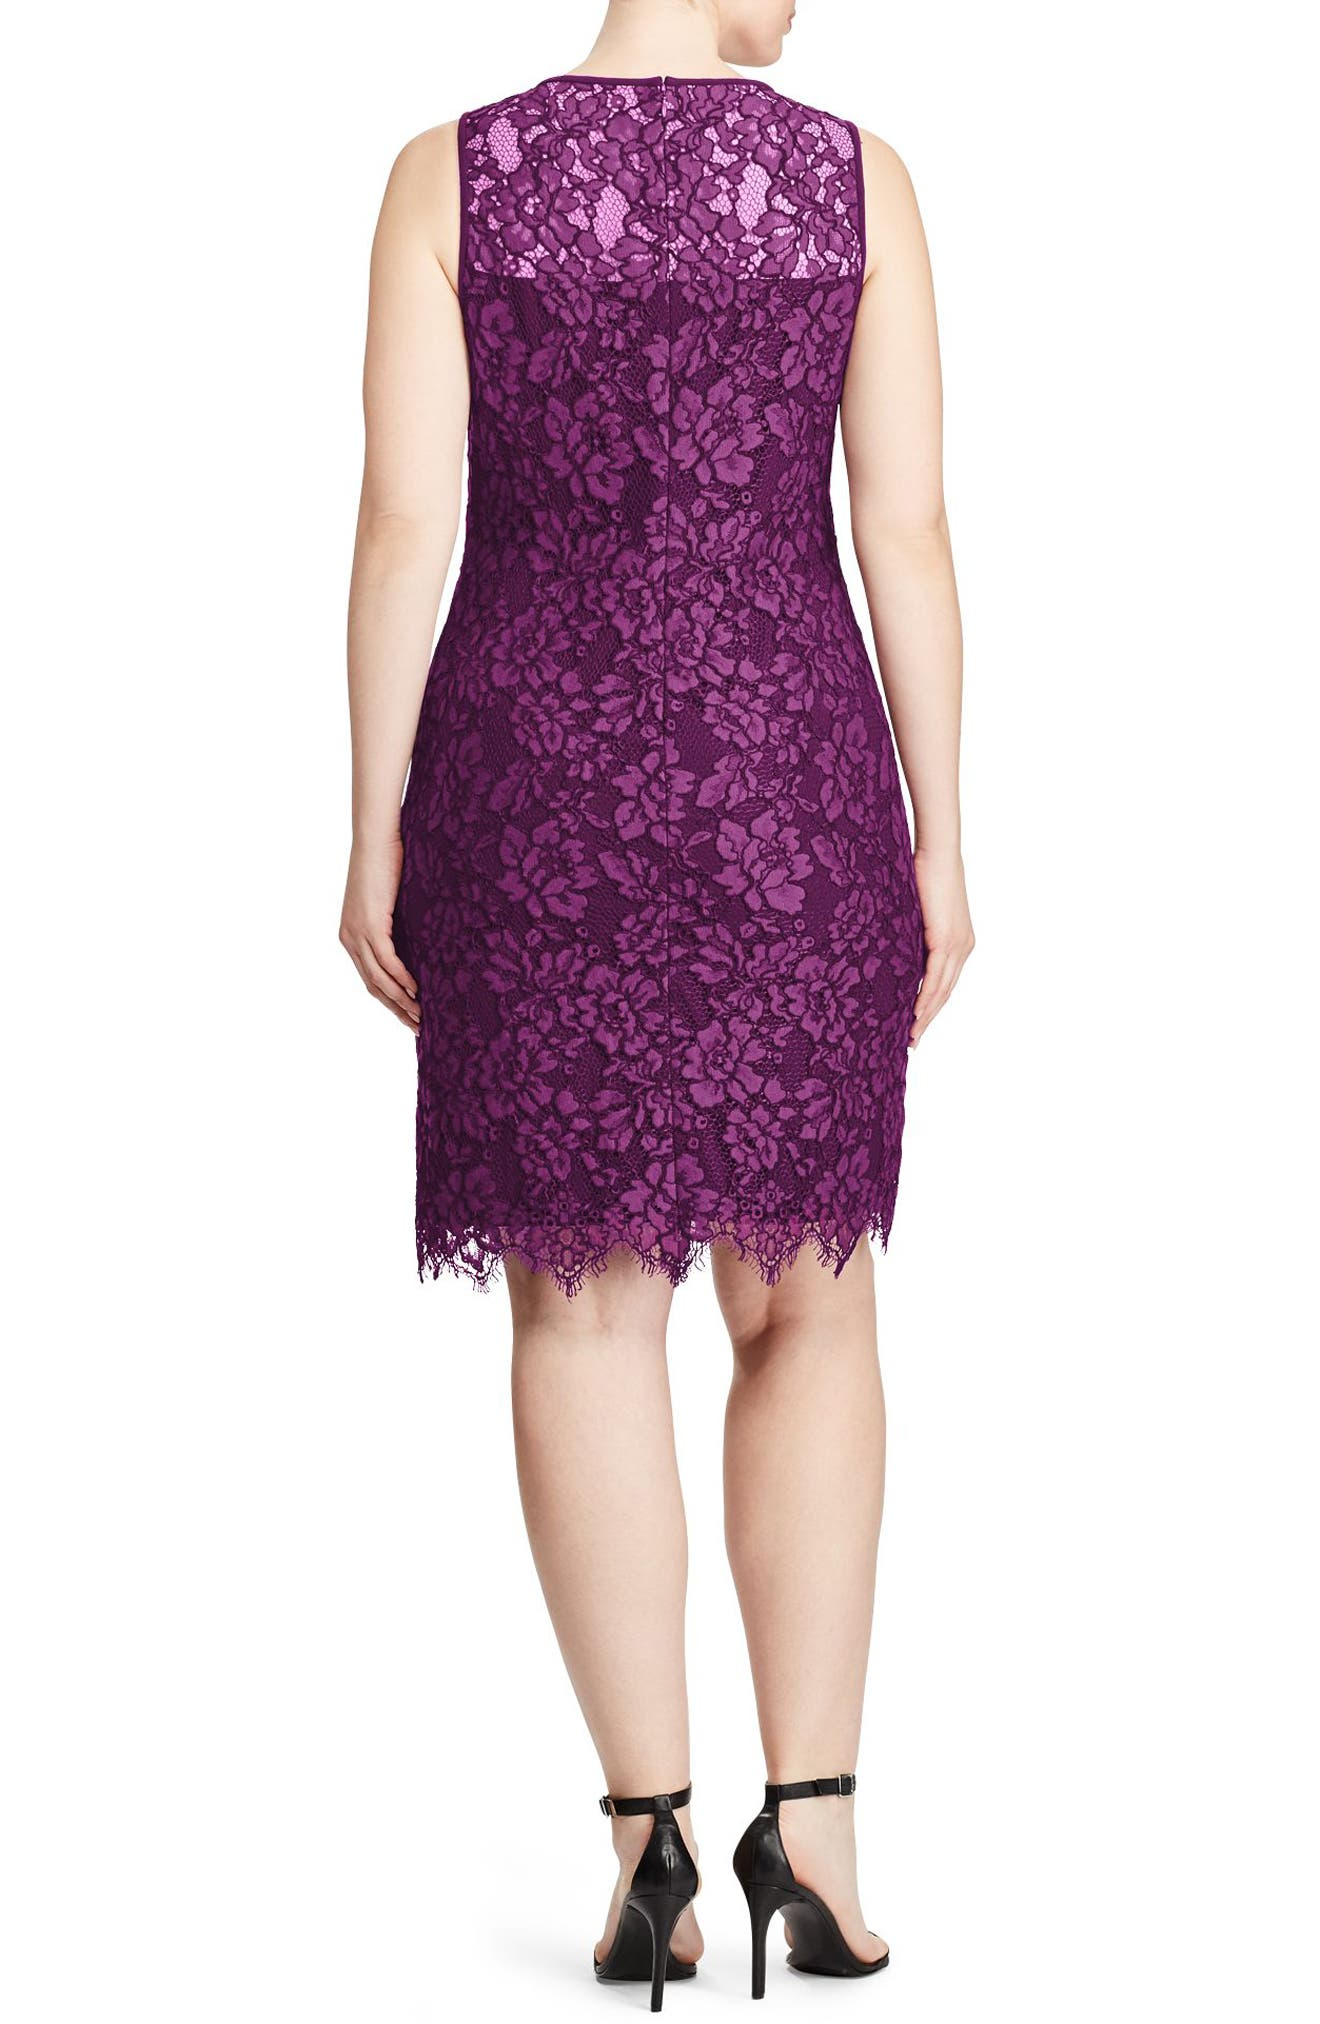 Corded Lace Sheath Dress,                             Alternate thumbnail 2, color,                             Plum-Wheat